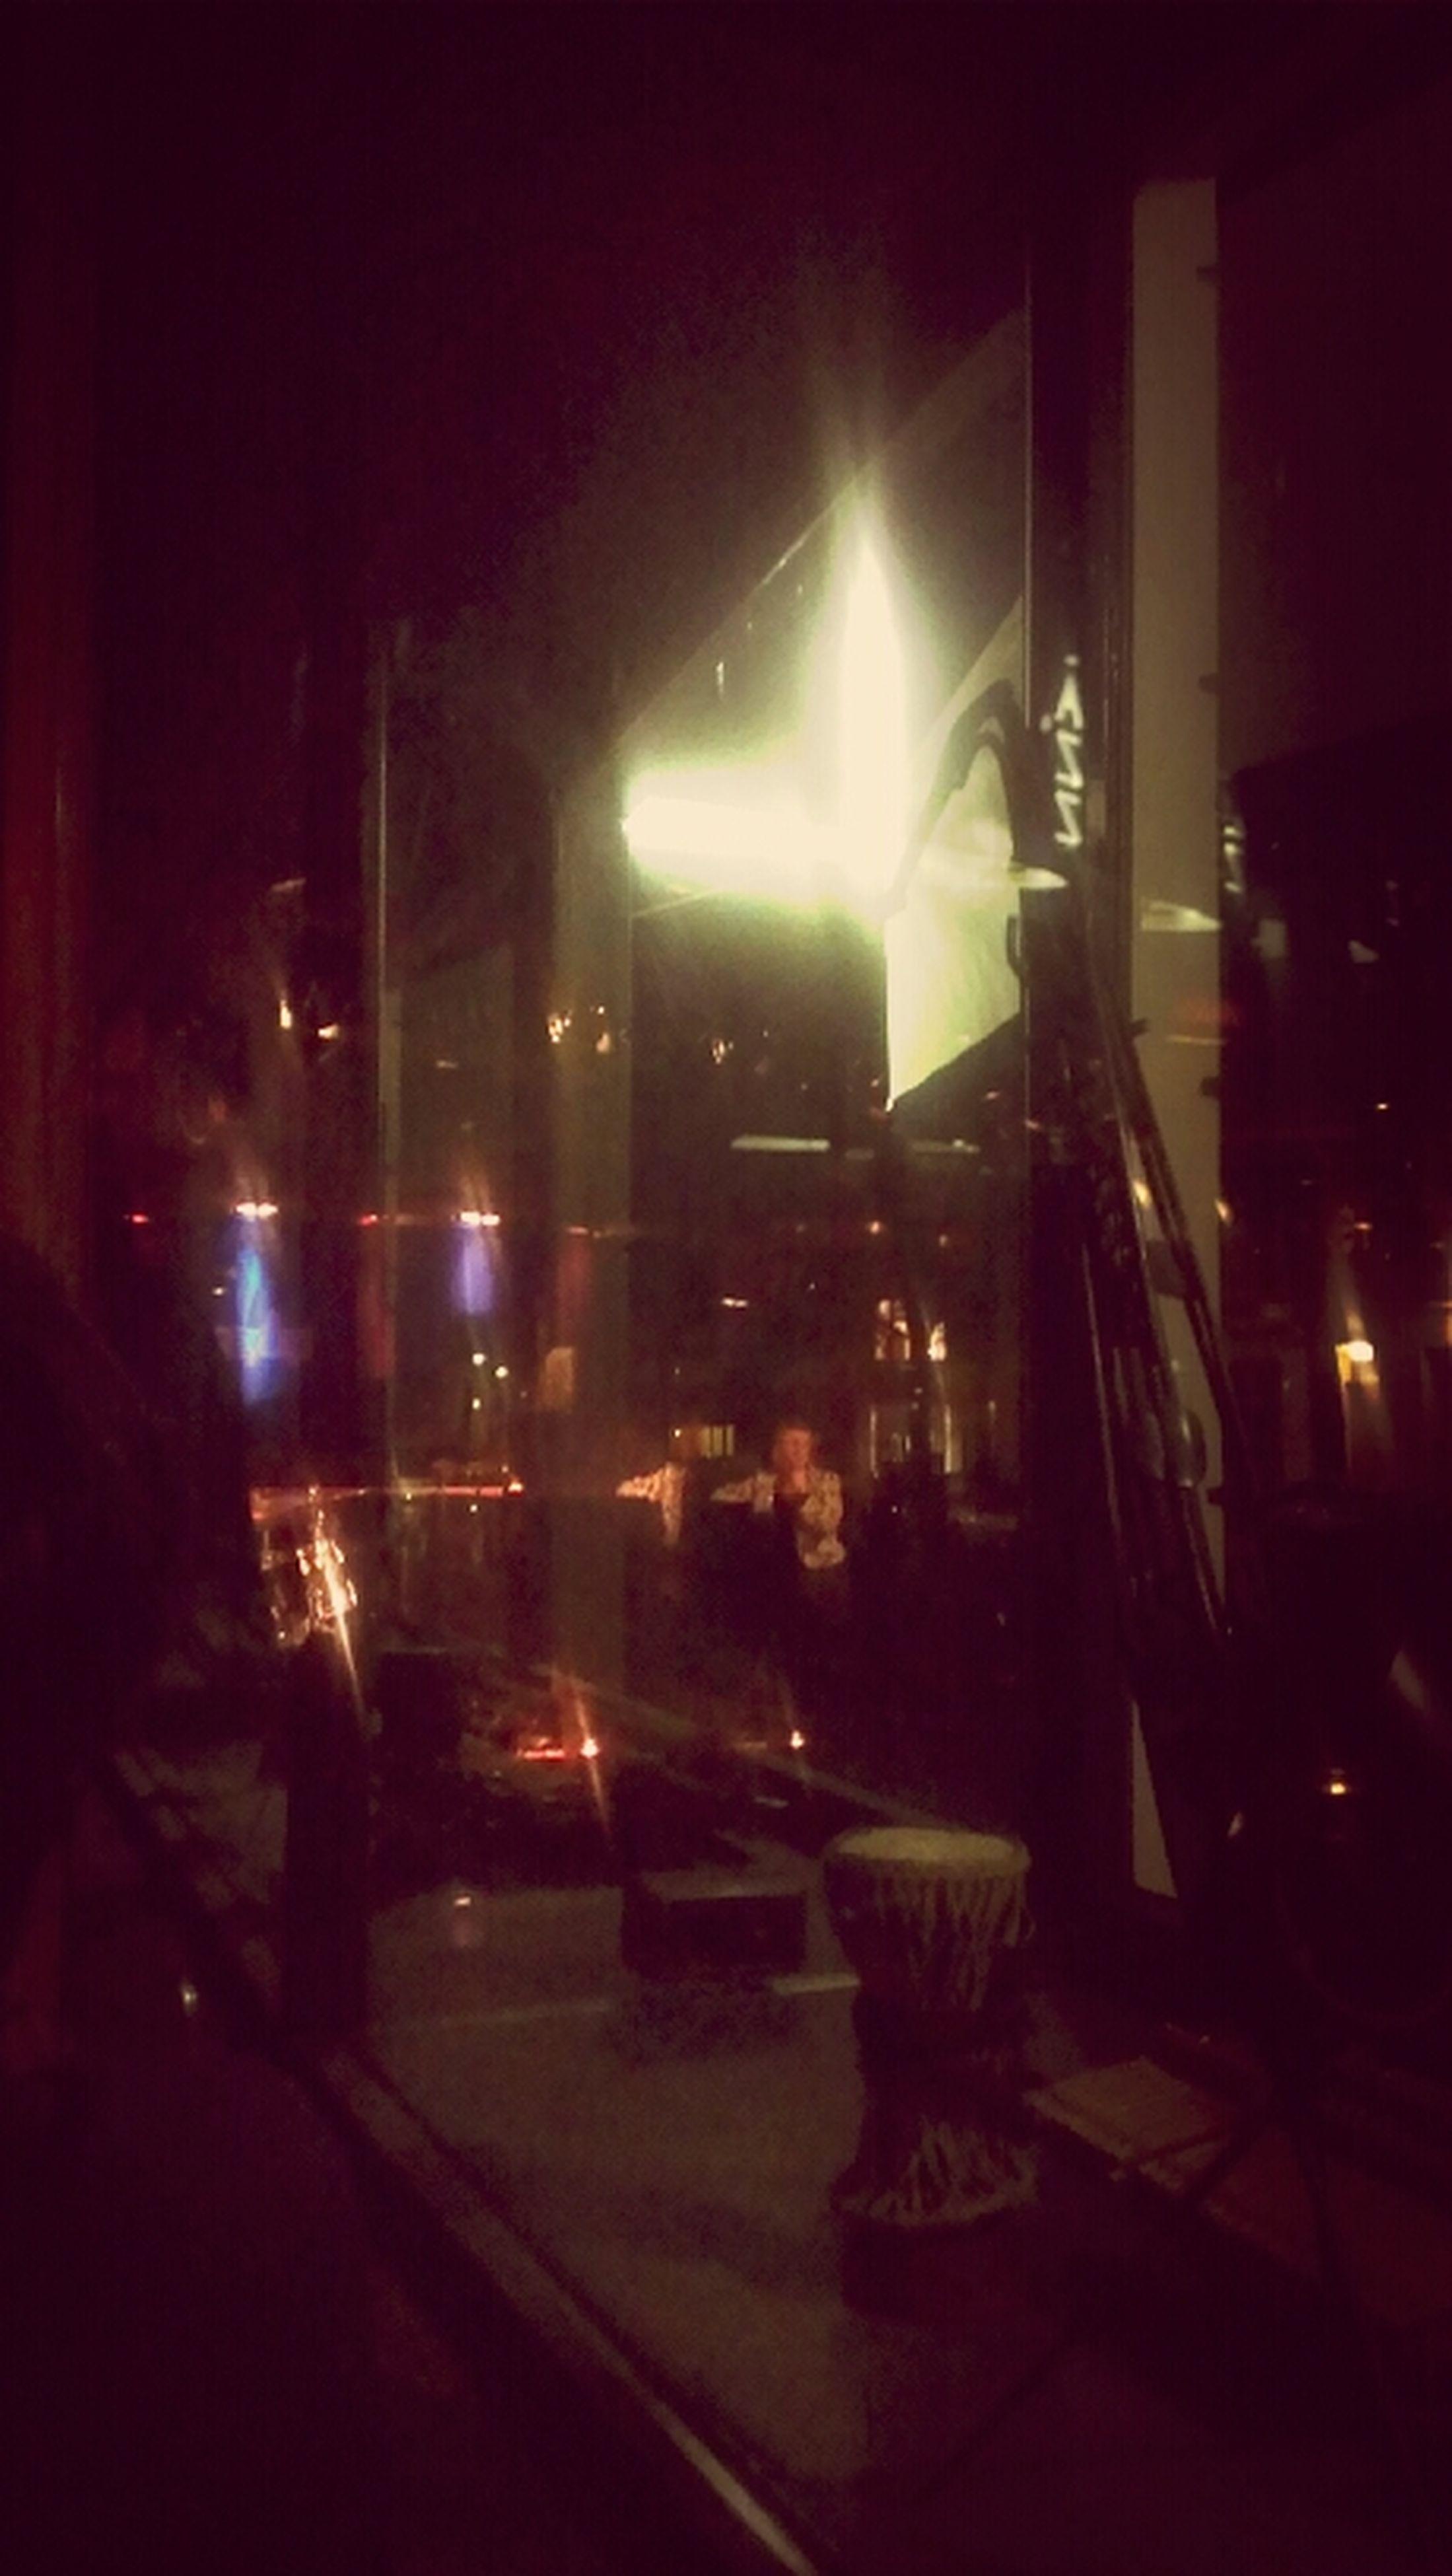 illuminated, night, building exterior, architecture, city, built structure, lighting equipment, dark, street, street light, light - natural phenomenon, city life, empty, window, incidental people, indoors, road, glass - material, no people